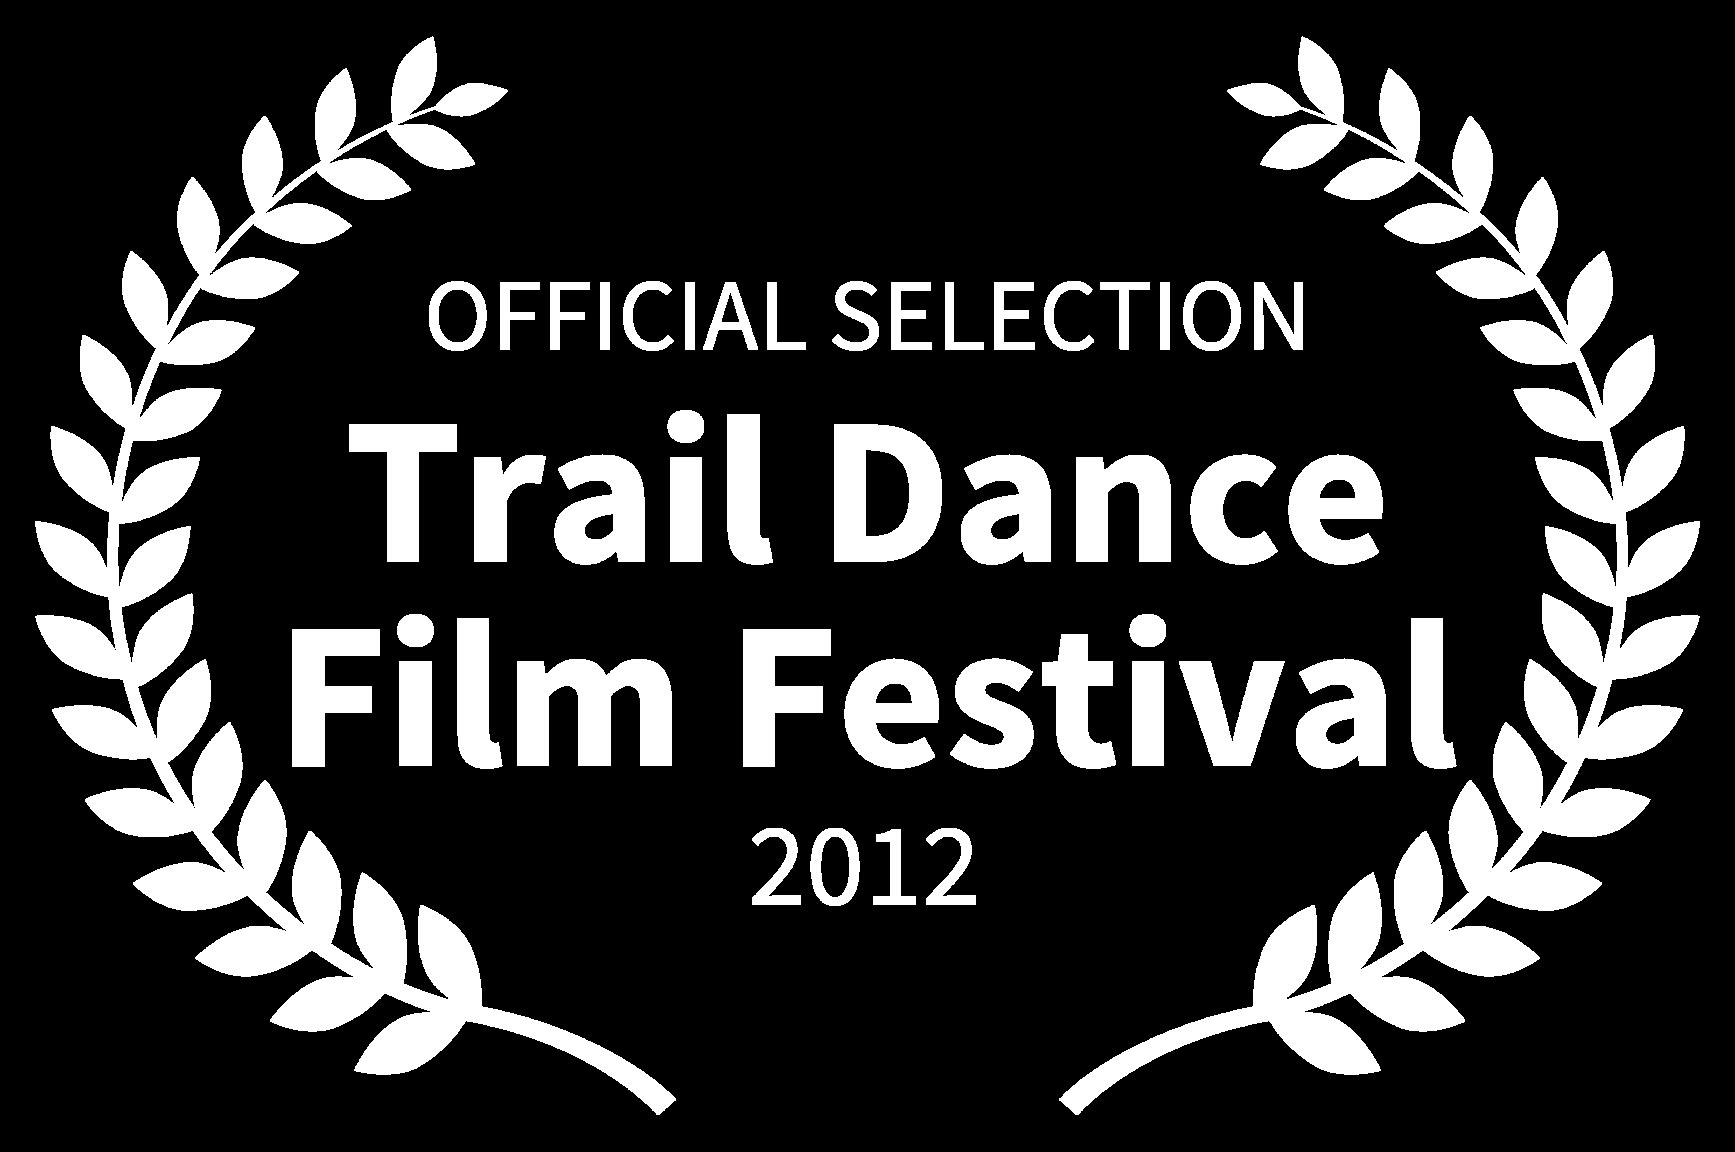 OFFICIAL SELECTION - Trail Dance Film Festival - 2012.png